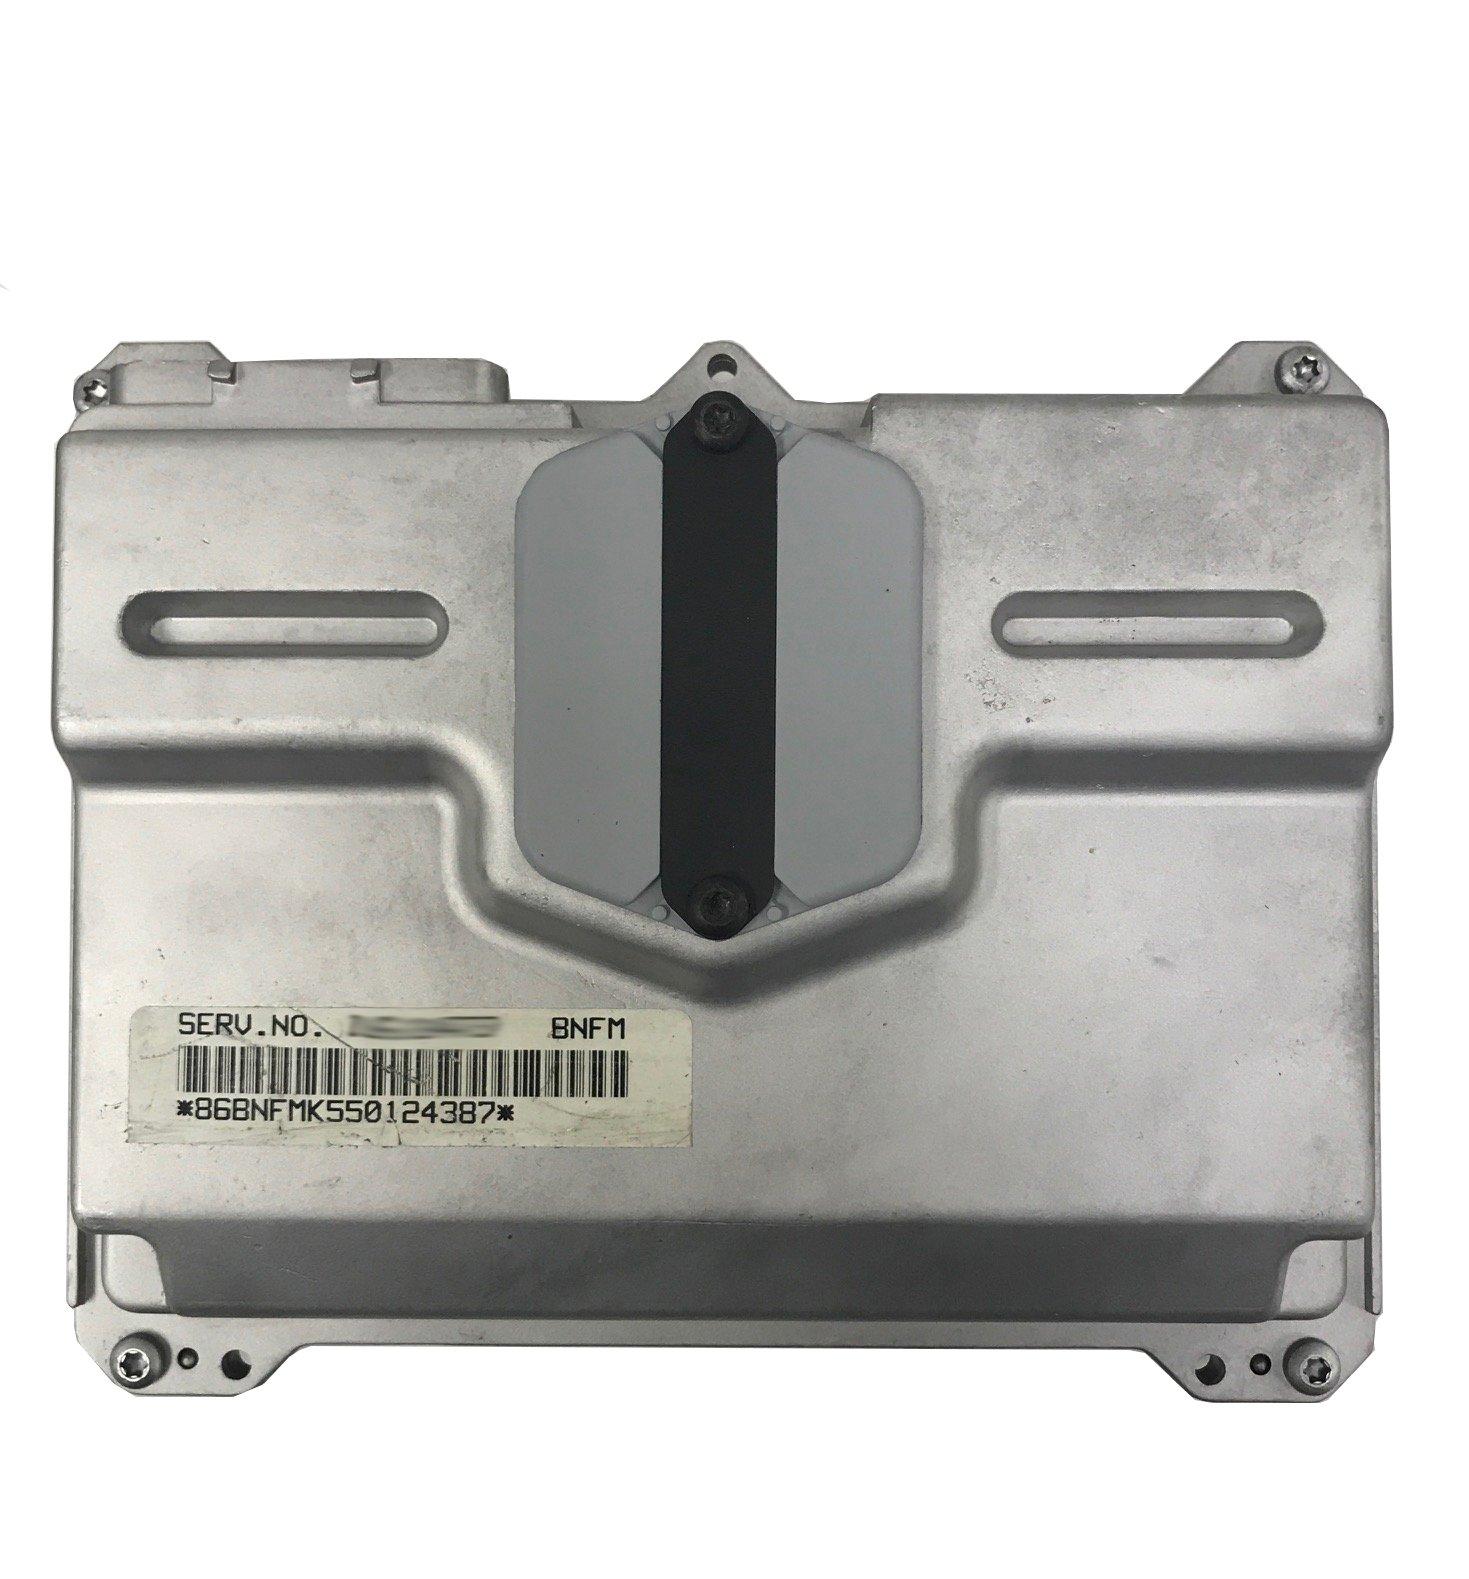 1996 GMC S-15 Serv. Num. 16215830 GM Engine Computer (Programmed to your VIN)